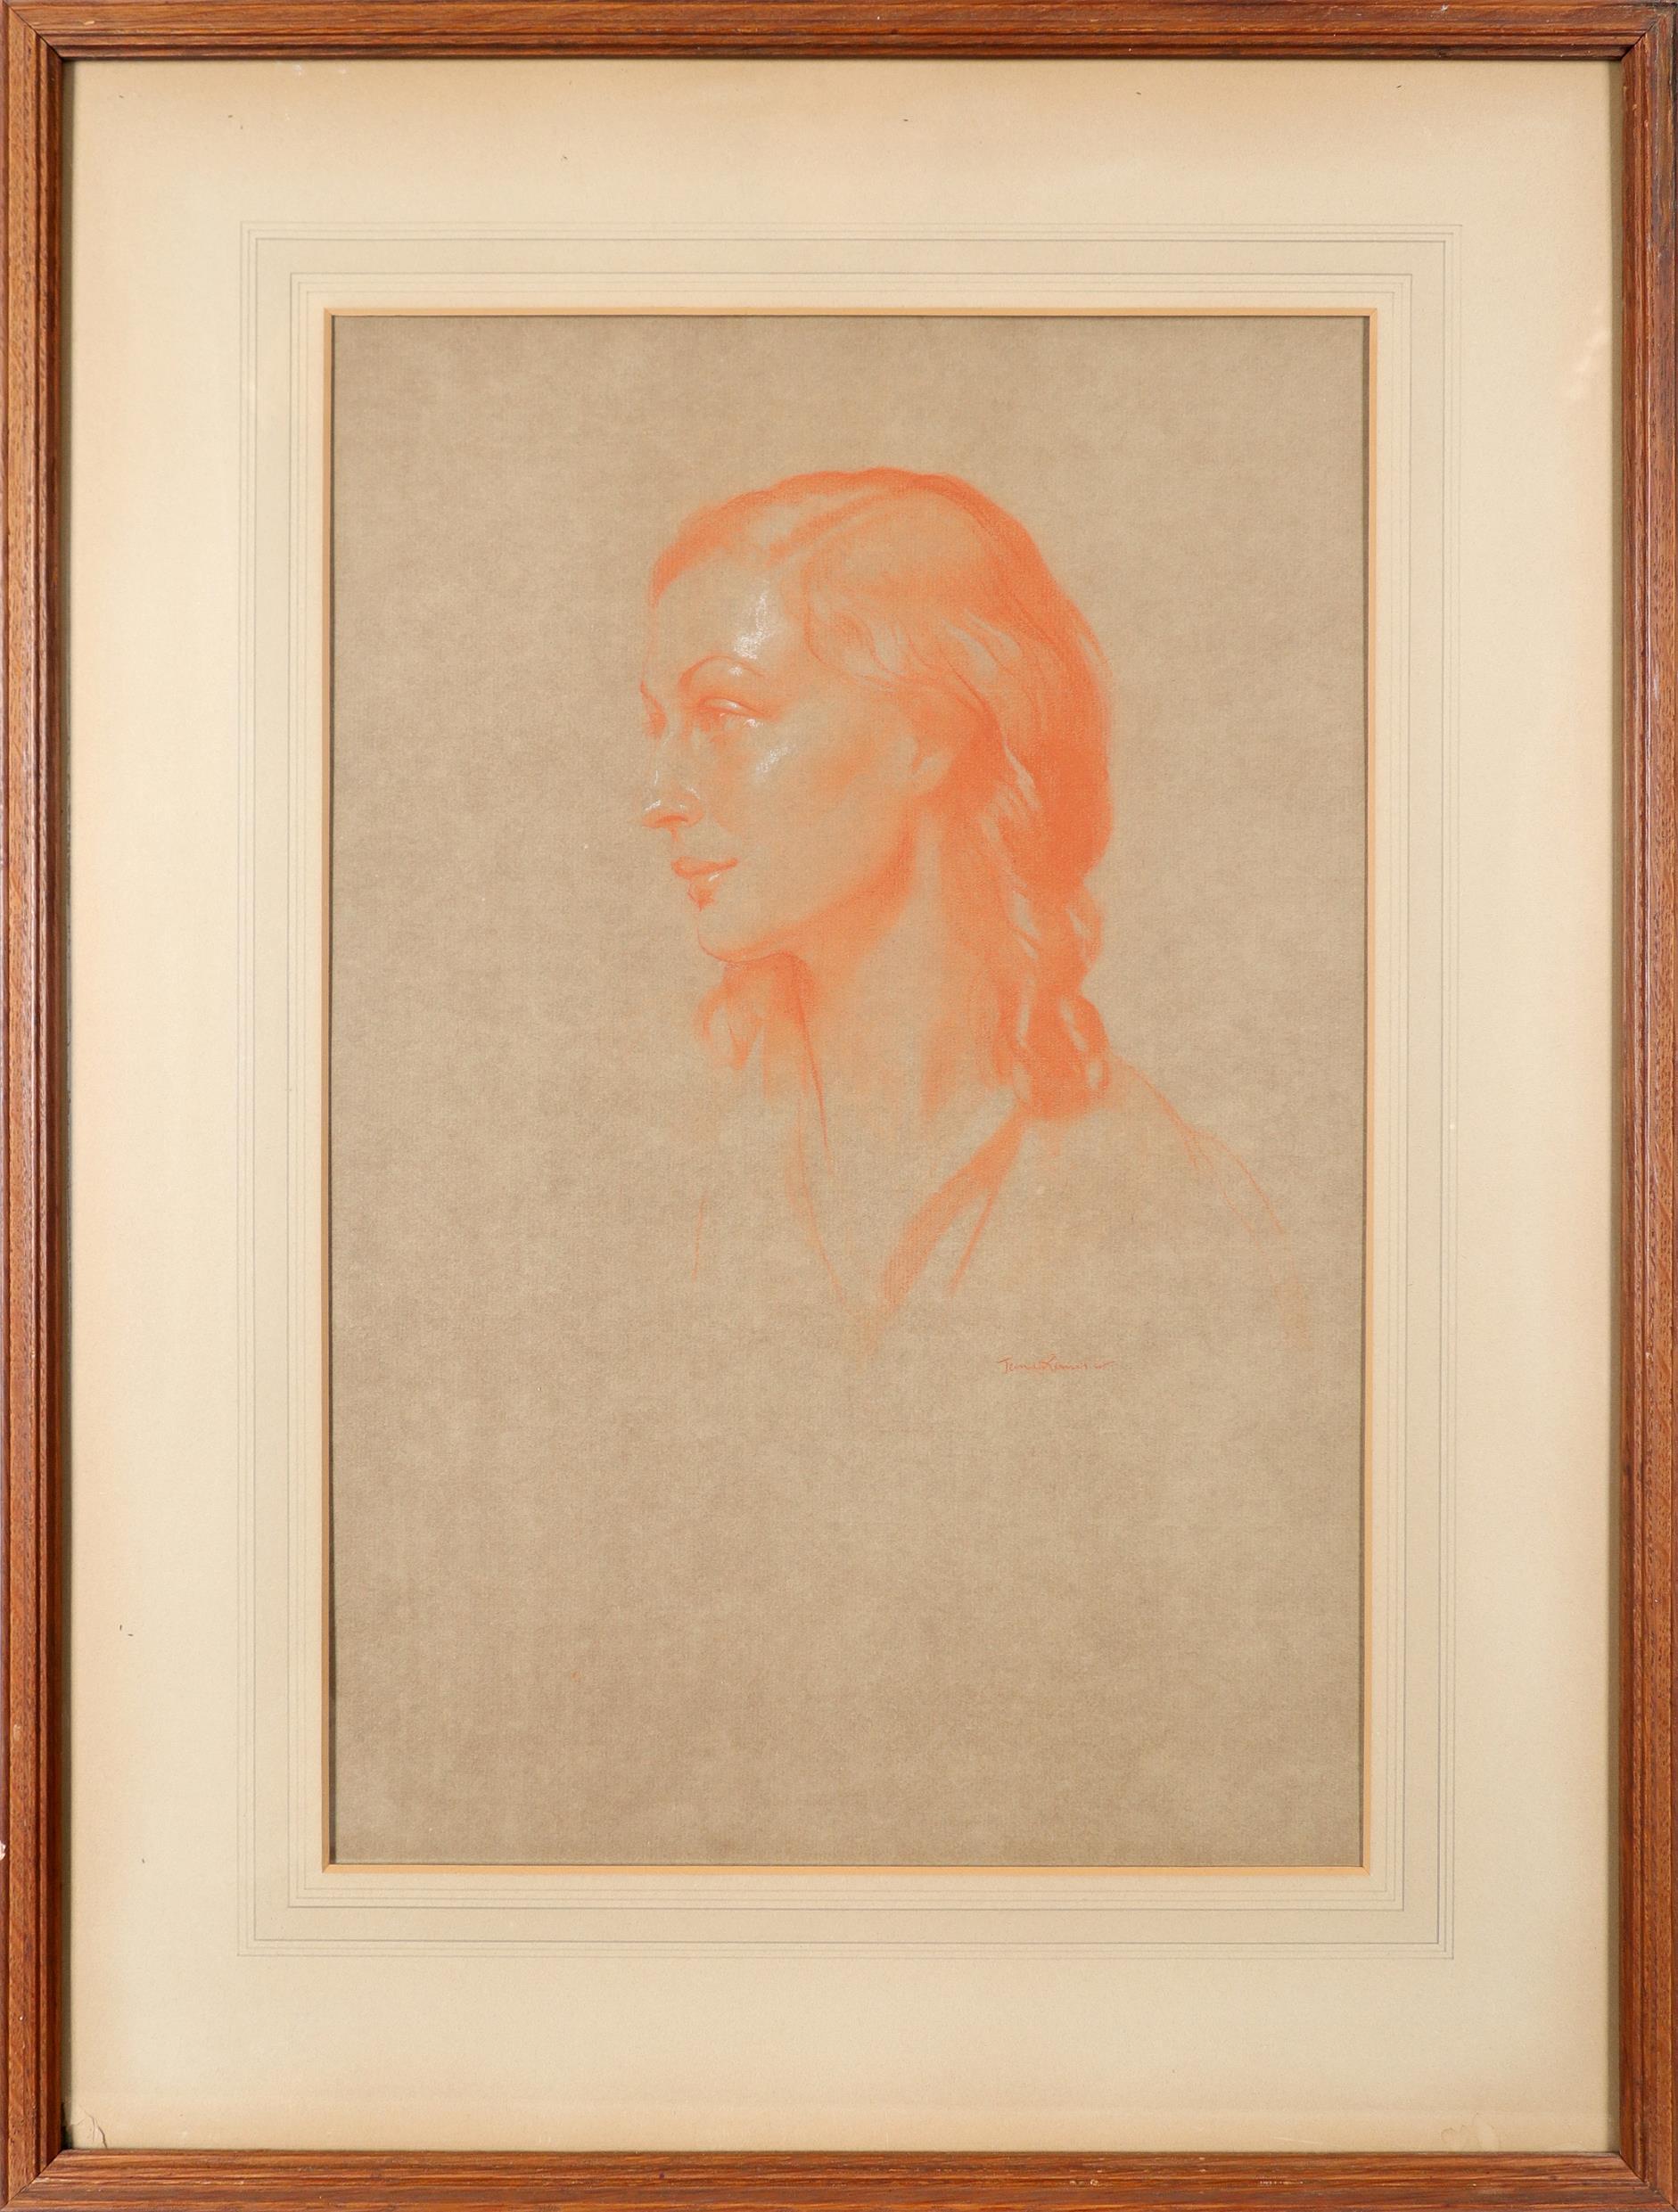 ‡Herbert James Gunn (1893-1964) Portrait of a woman Signed James Gunn (lower right) Red chalk - Image 2 of 3